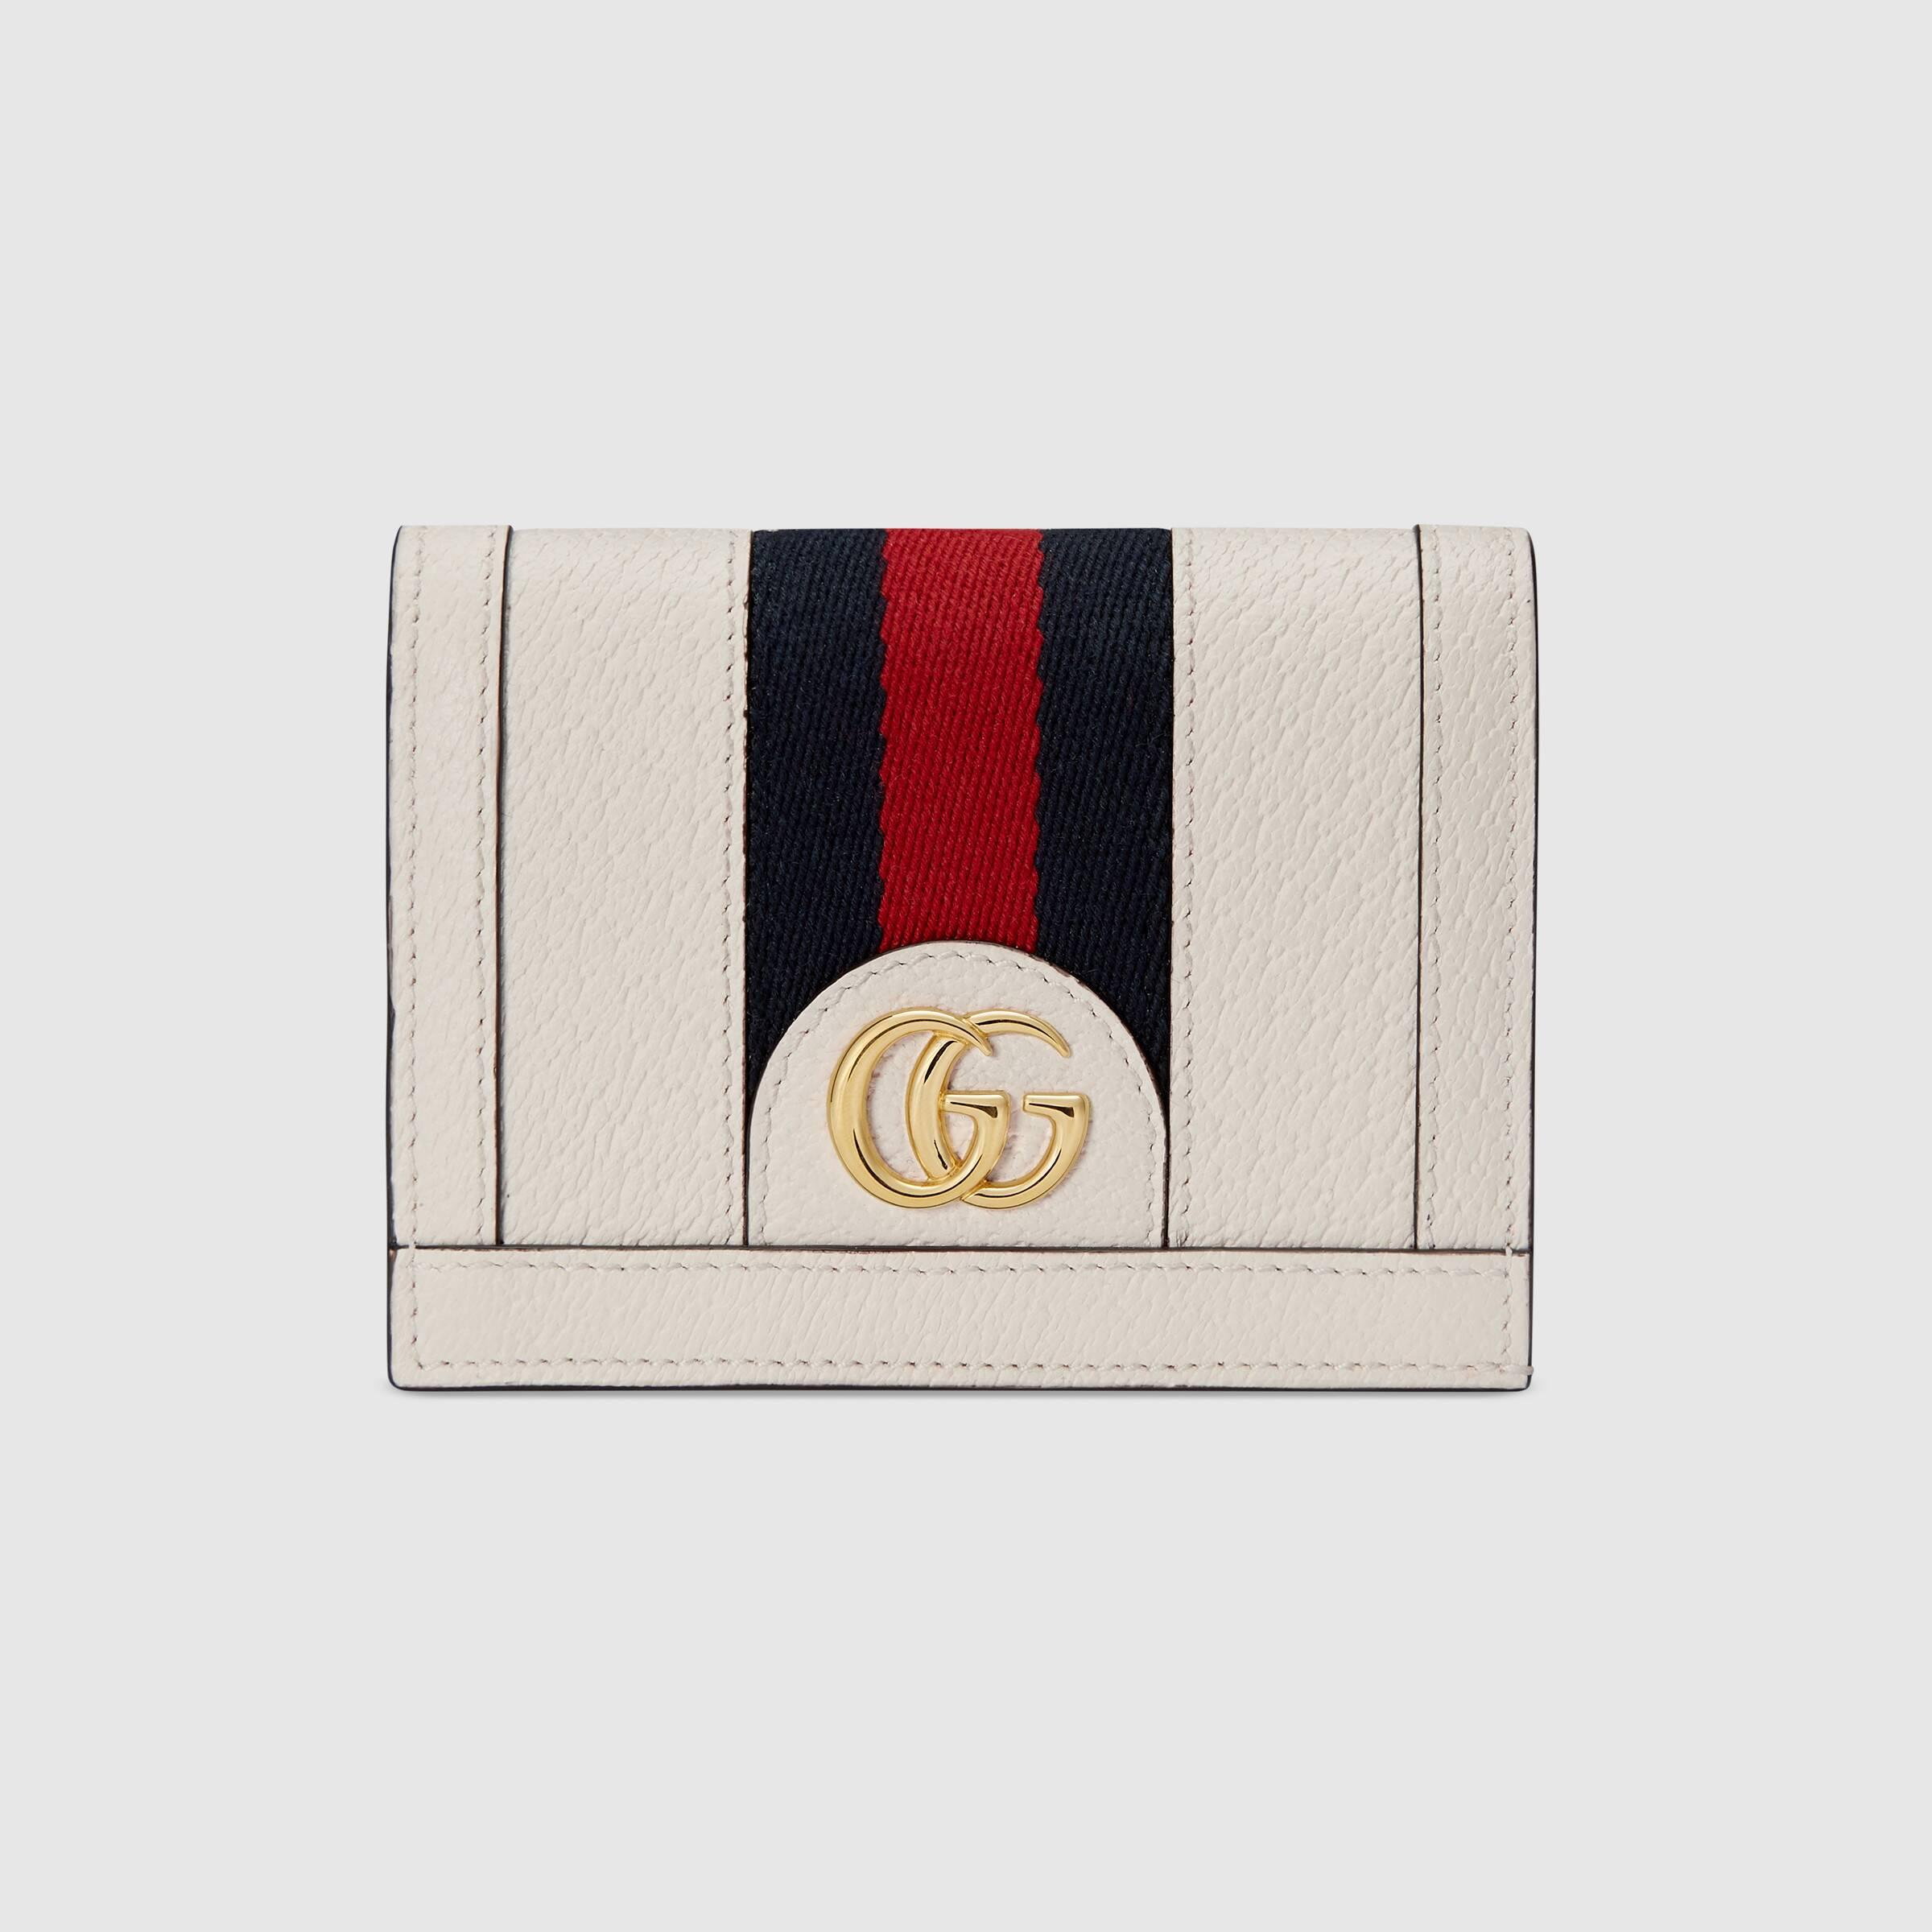 Gucci Ophidia card case wallet 523155 DJ2DG 8454